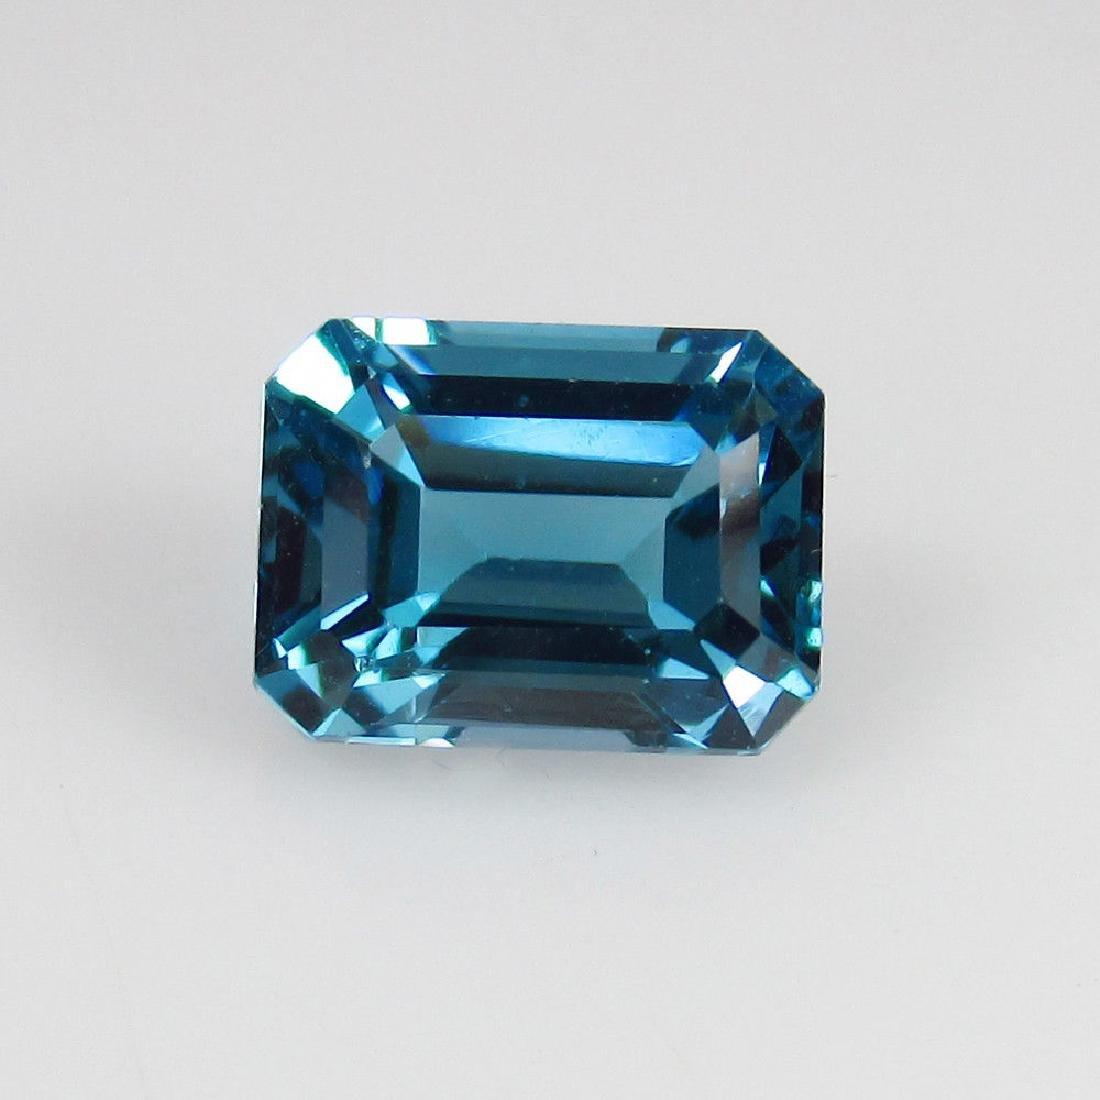 2.47 Ctw Natural Loose London Blue Topaz Emerald Cut